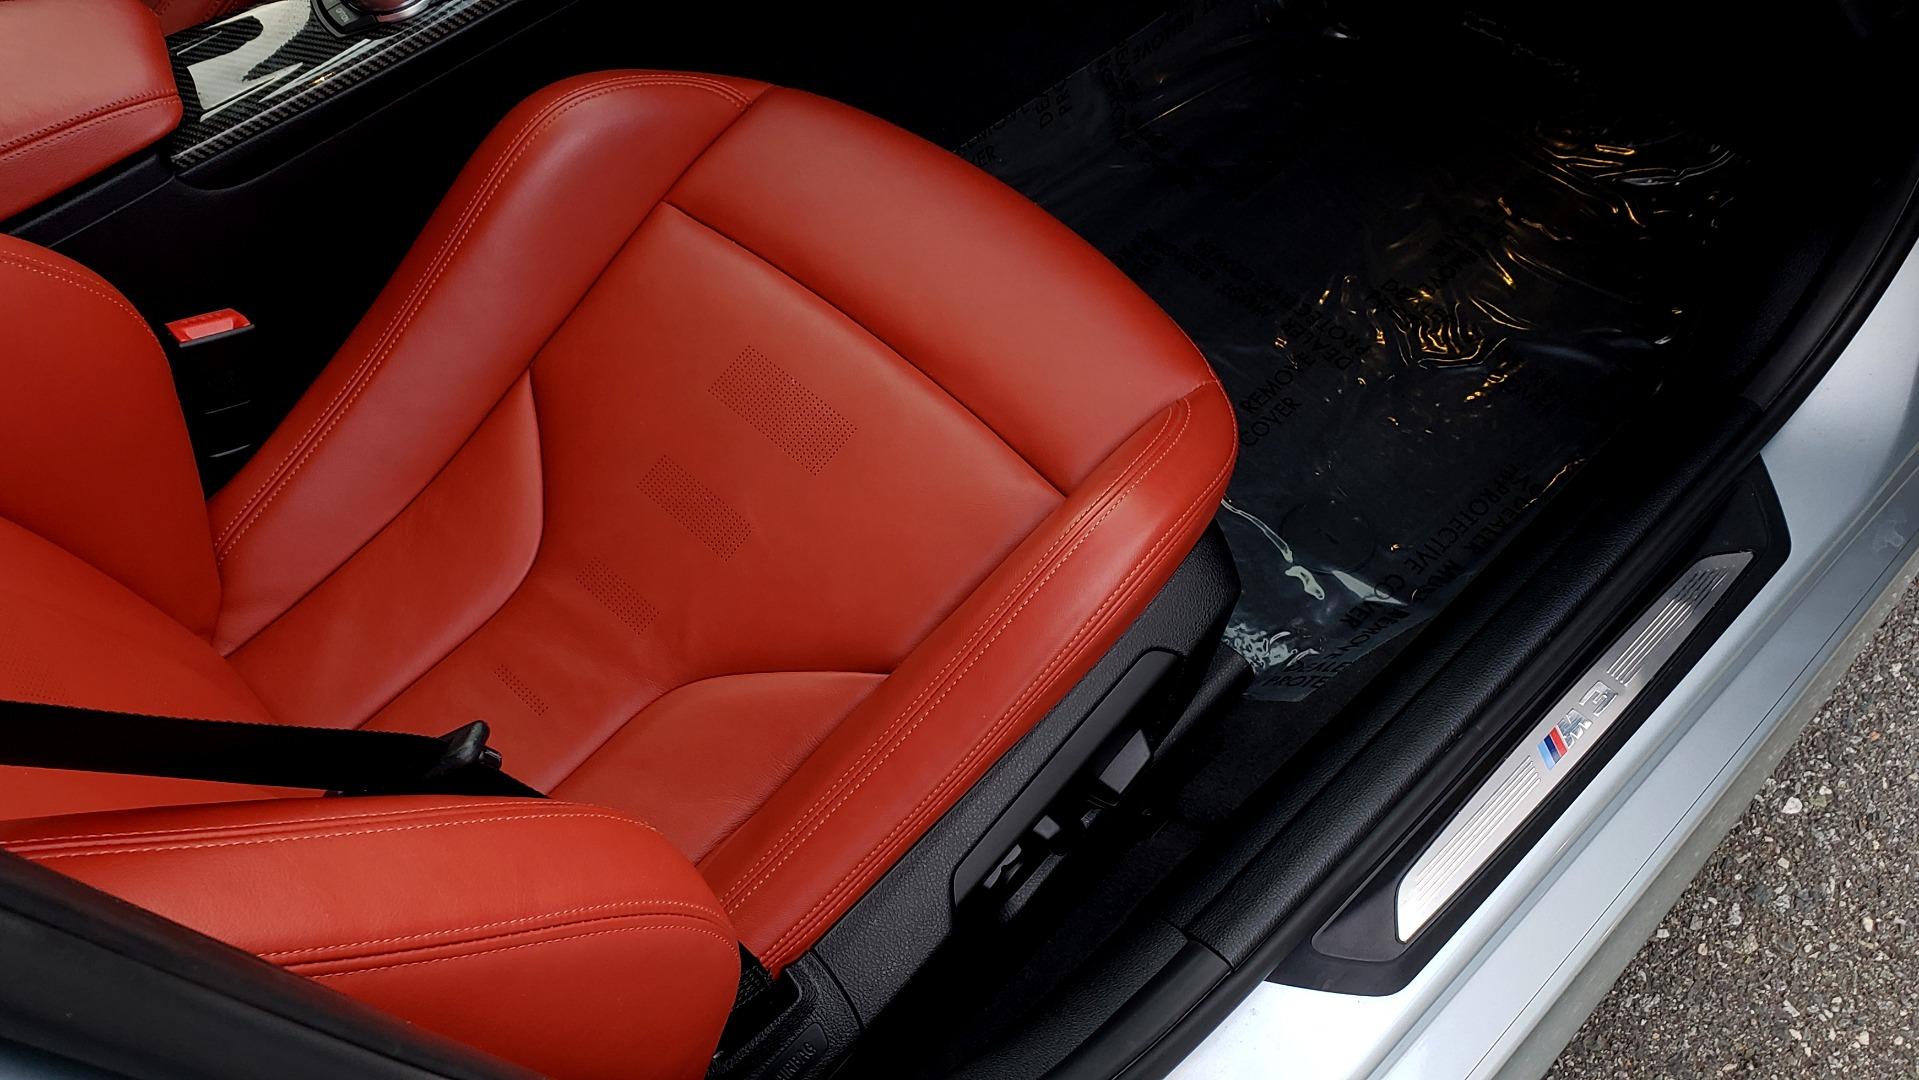 Used 2015 BMW M3 EXECUTIVE PKG / NAV / CAMERA / HUD / CARBON FIBER ROOF for sale Sold at Formula Imports in Charlotte NC 28227 77